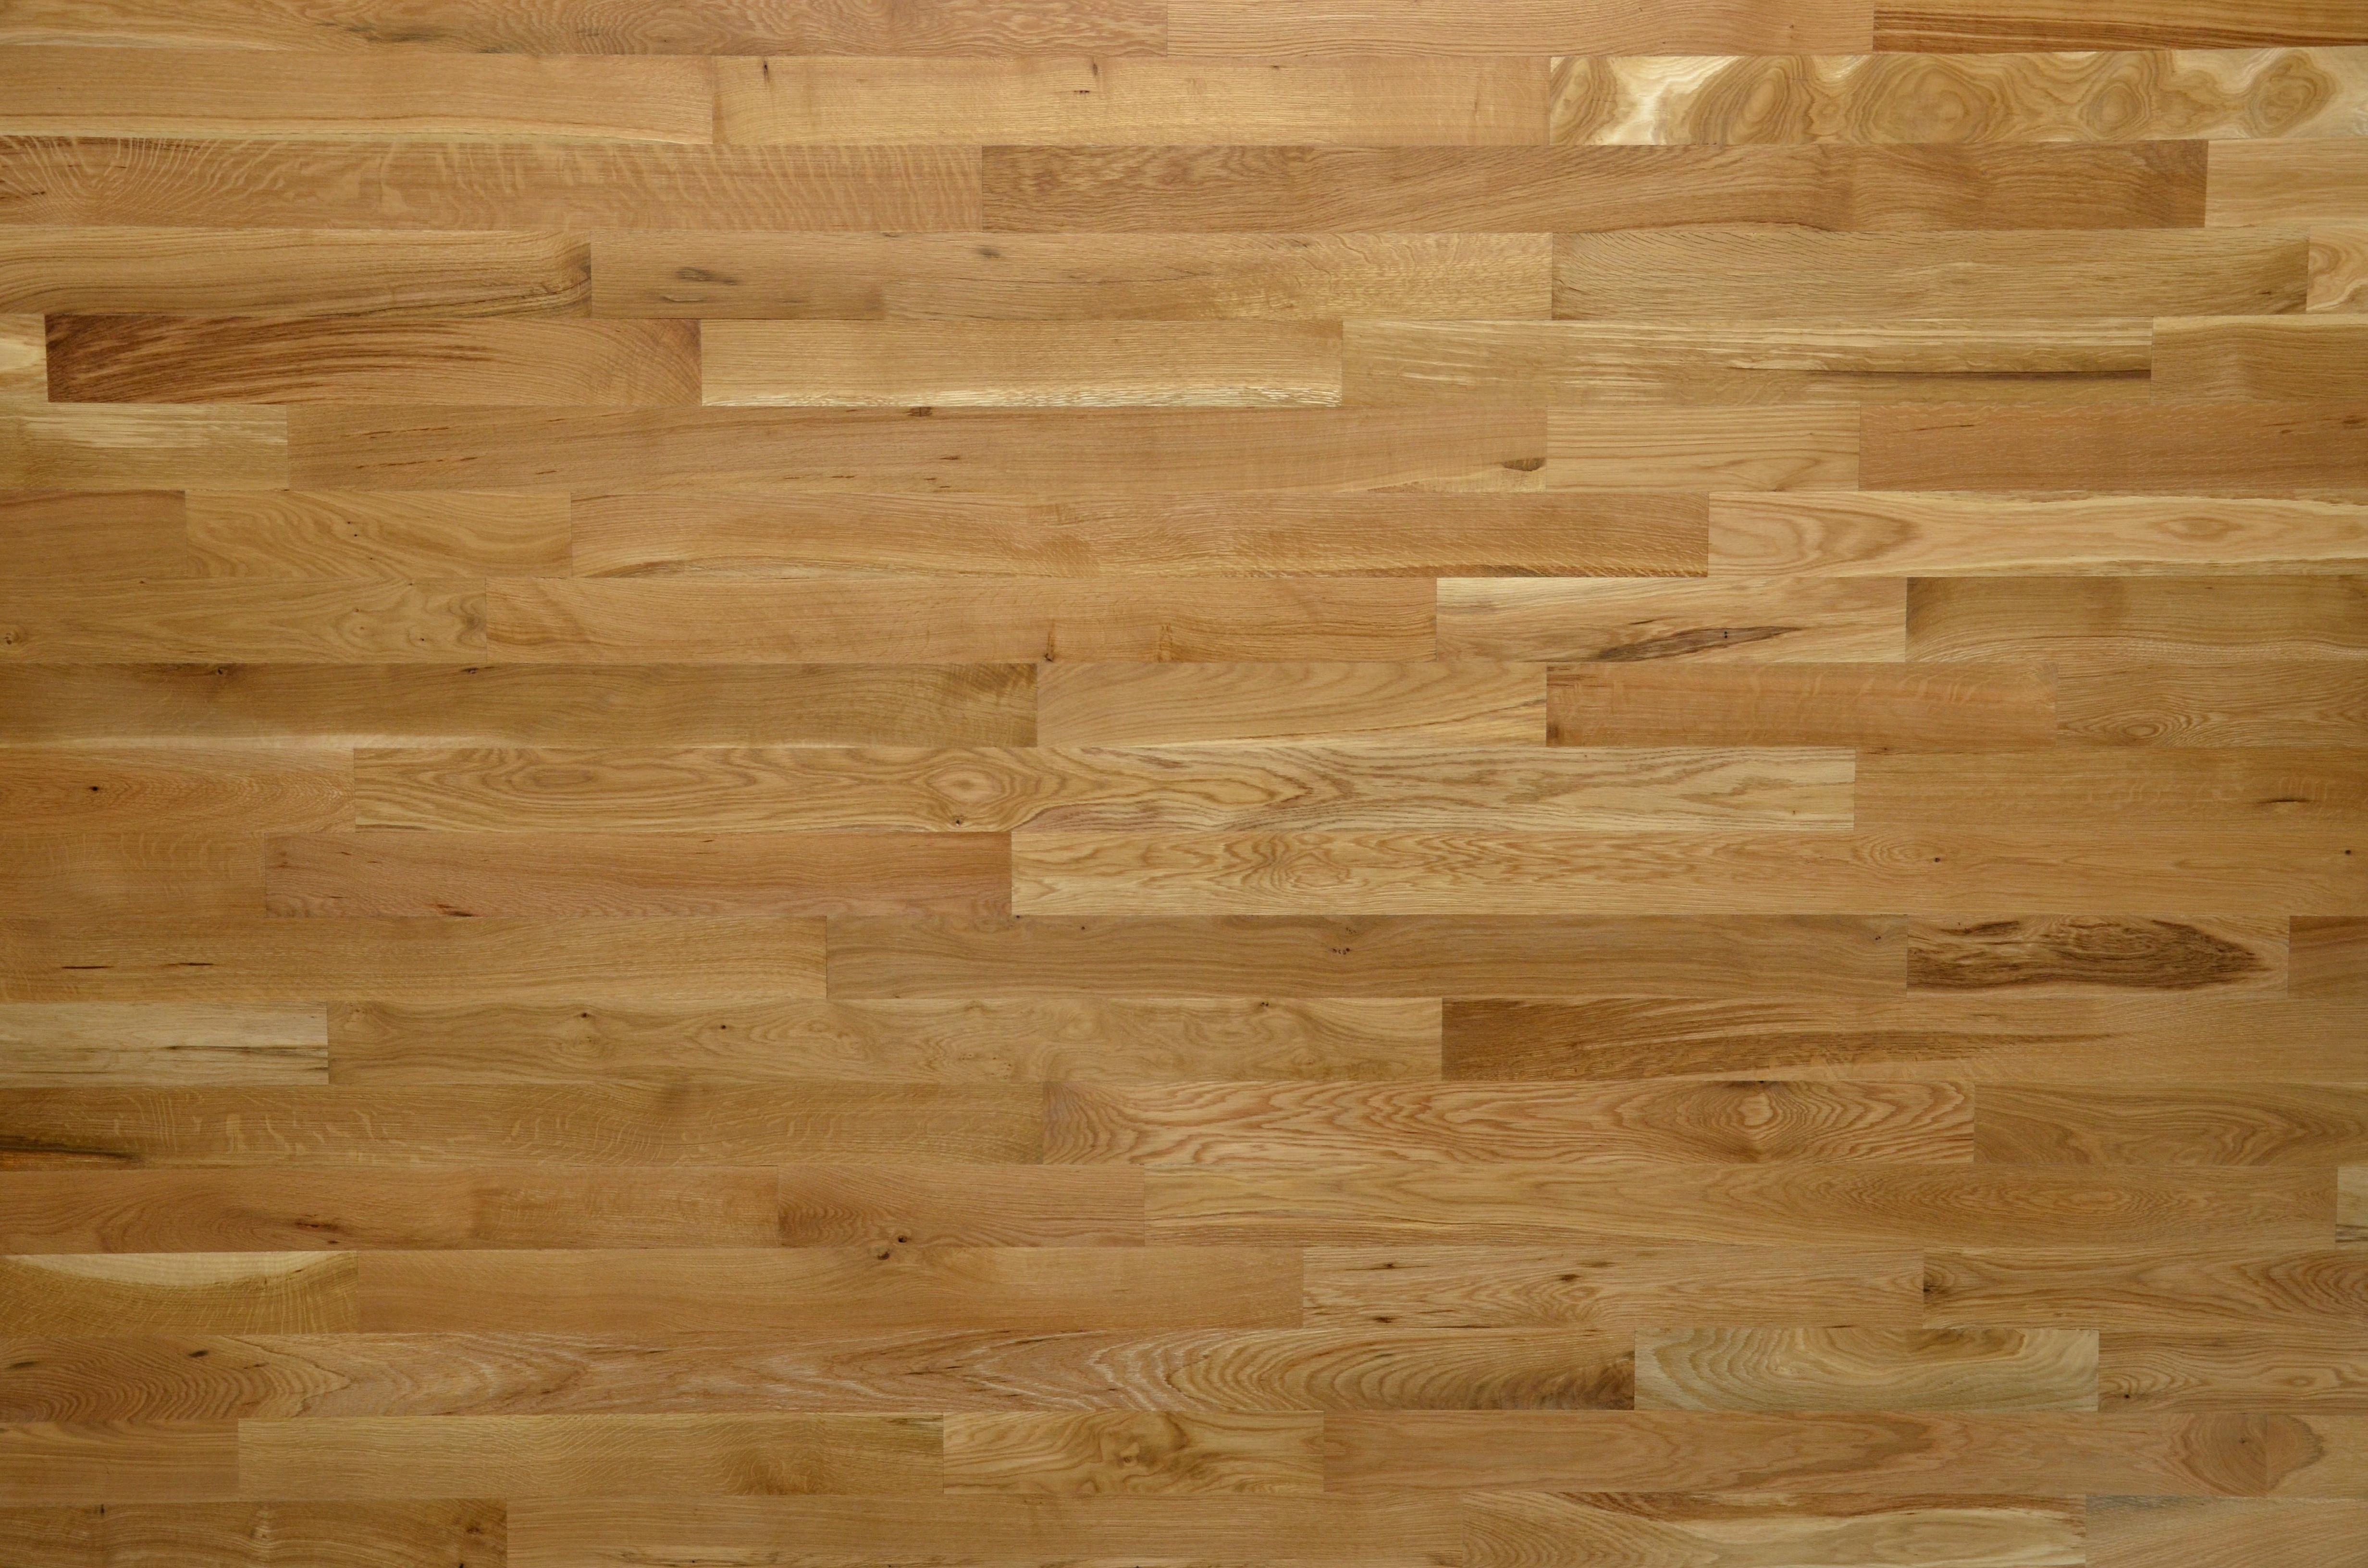 oak hardwood flooring colors of lacrosse hardwood flooring walnut white oak red oak hickory throughout 1 common white oak a floor